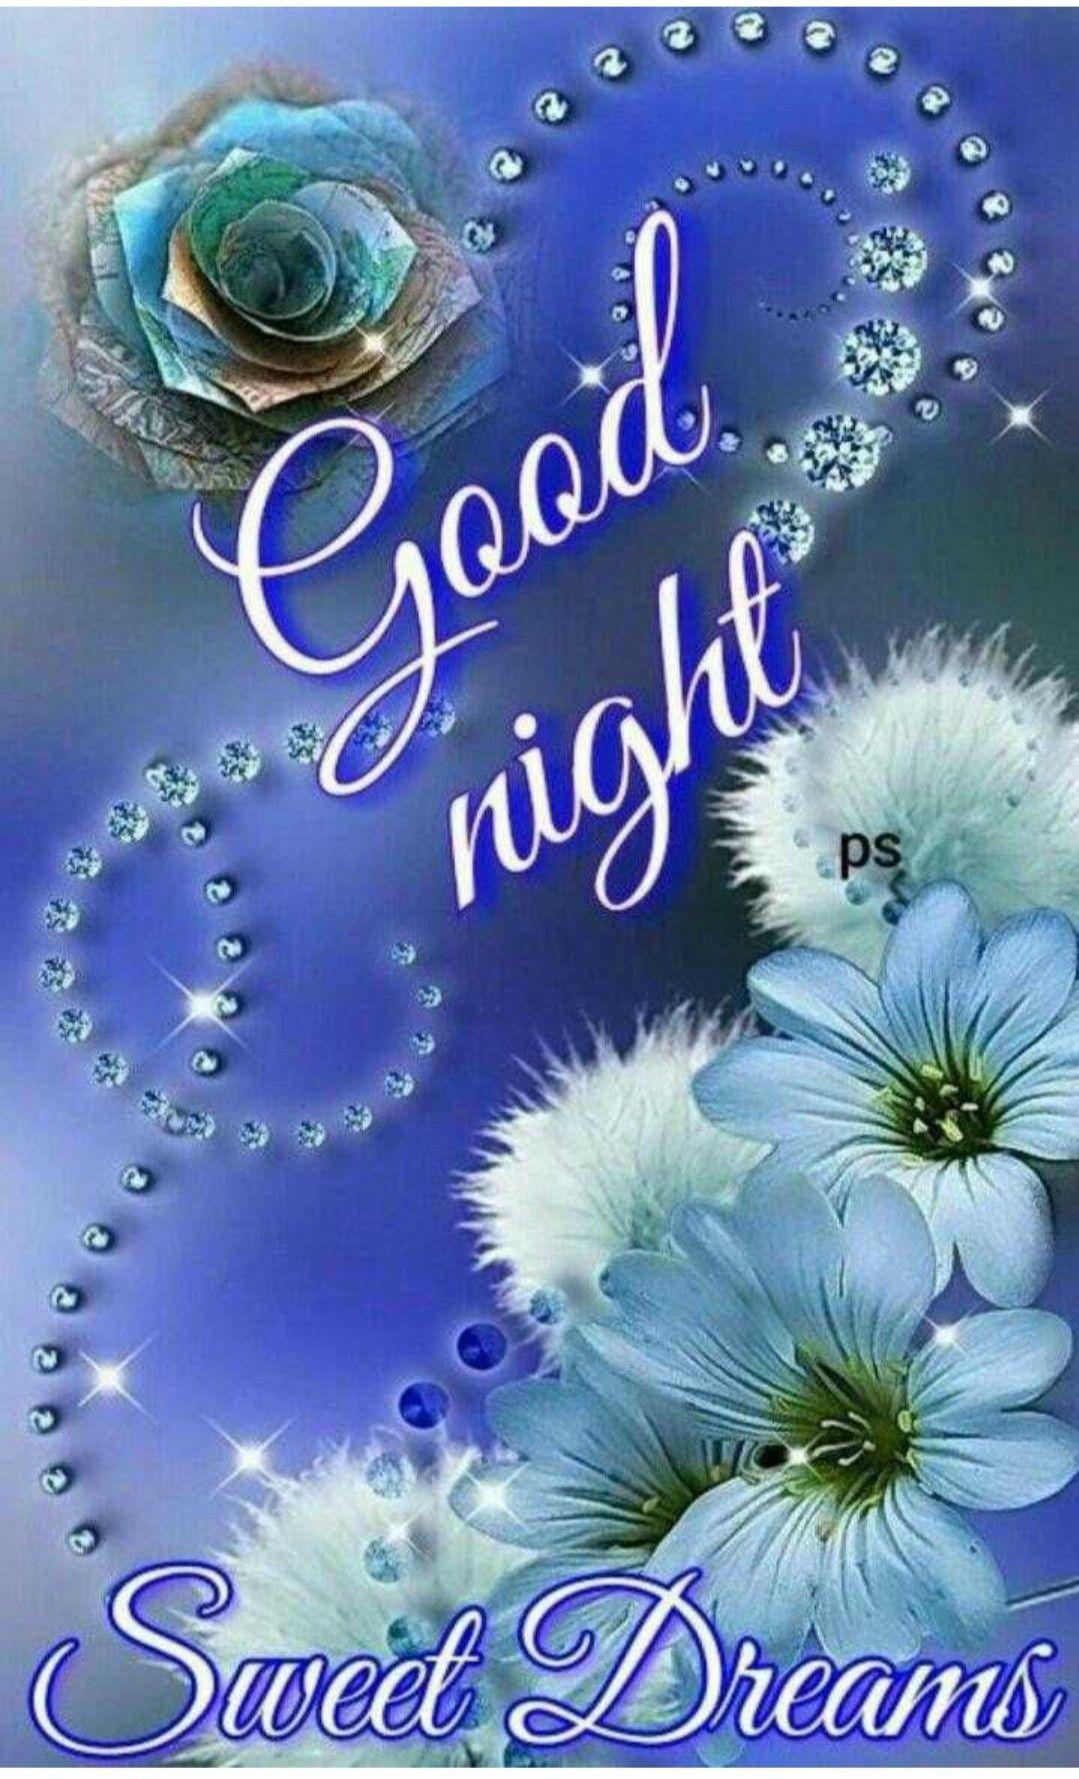 Goodnight Sweet Dreams Goodnight Good Night